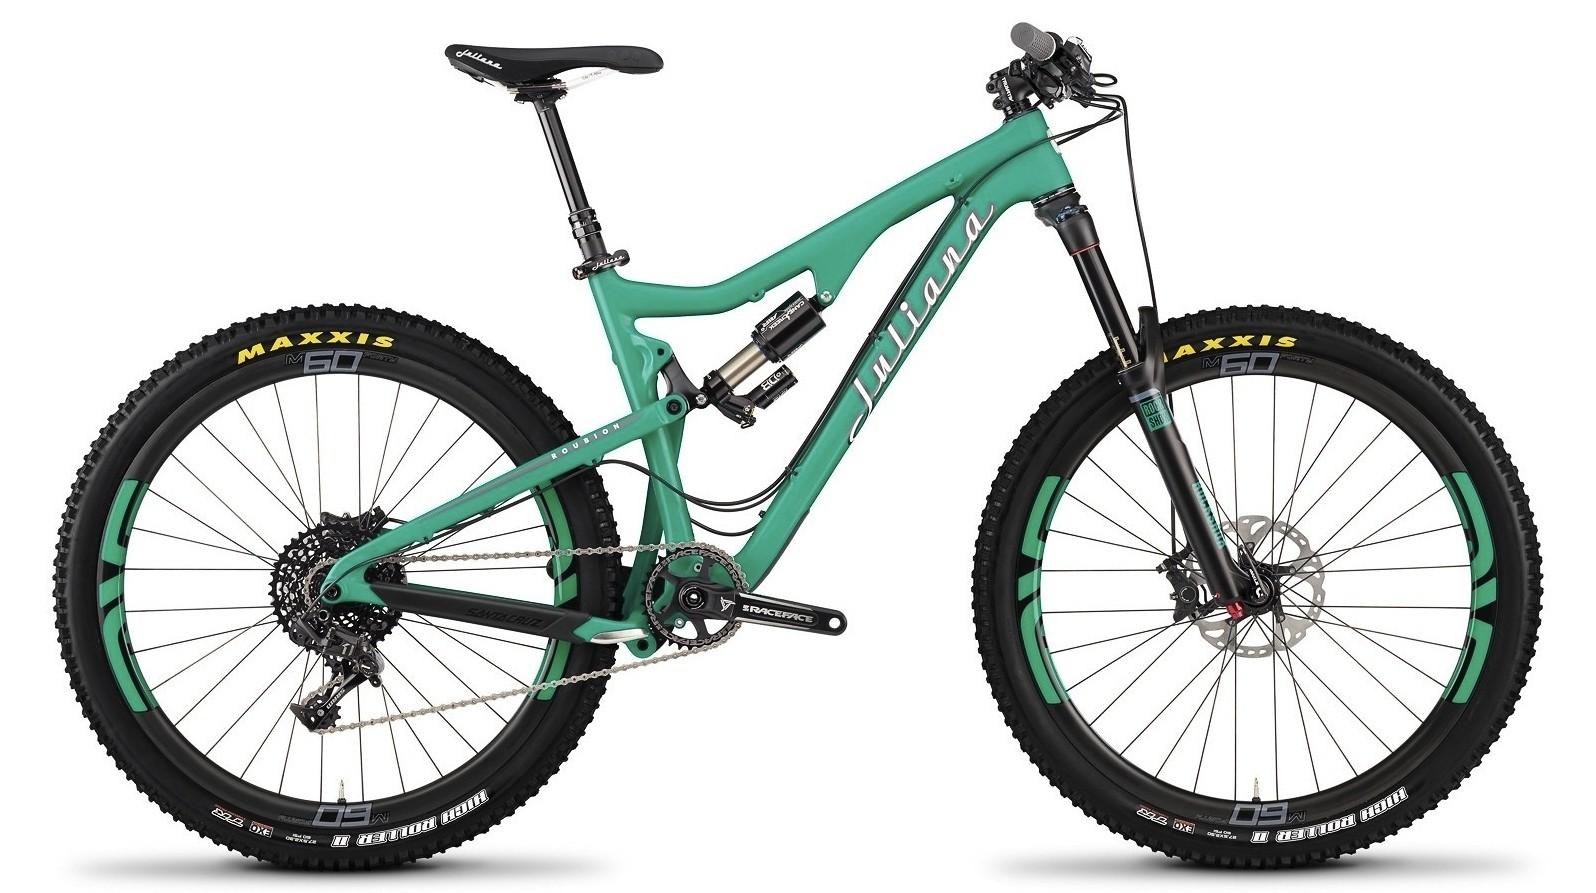 2015 Juliana Roubion bike